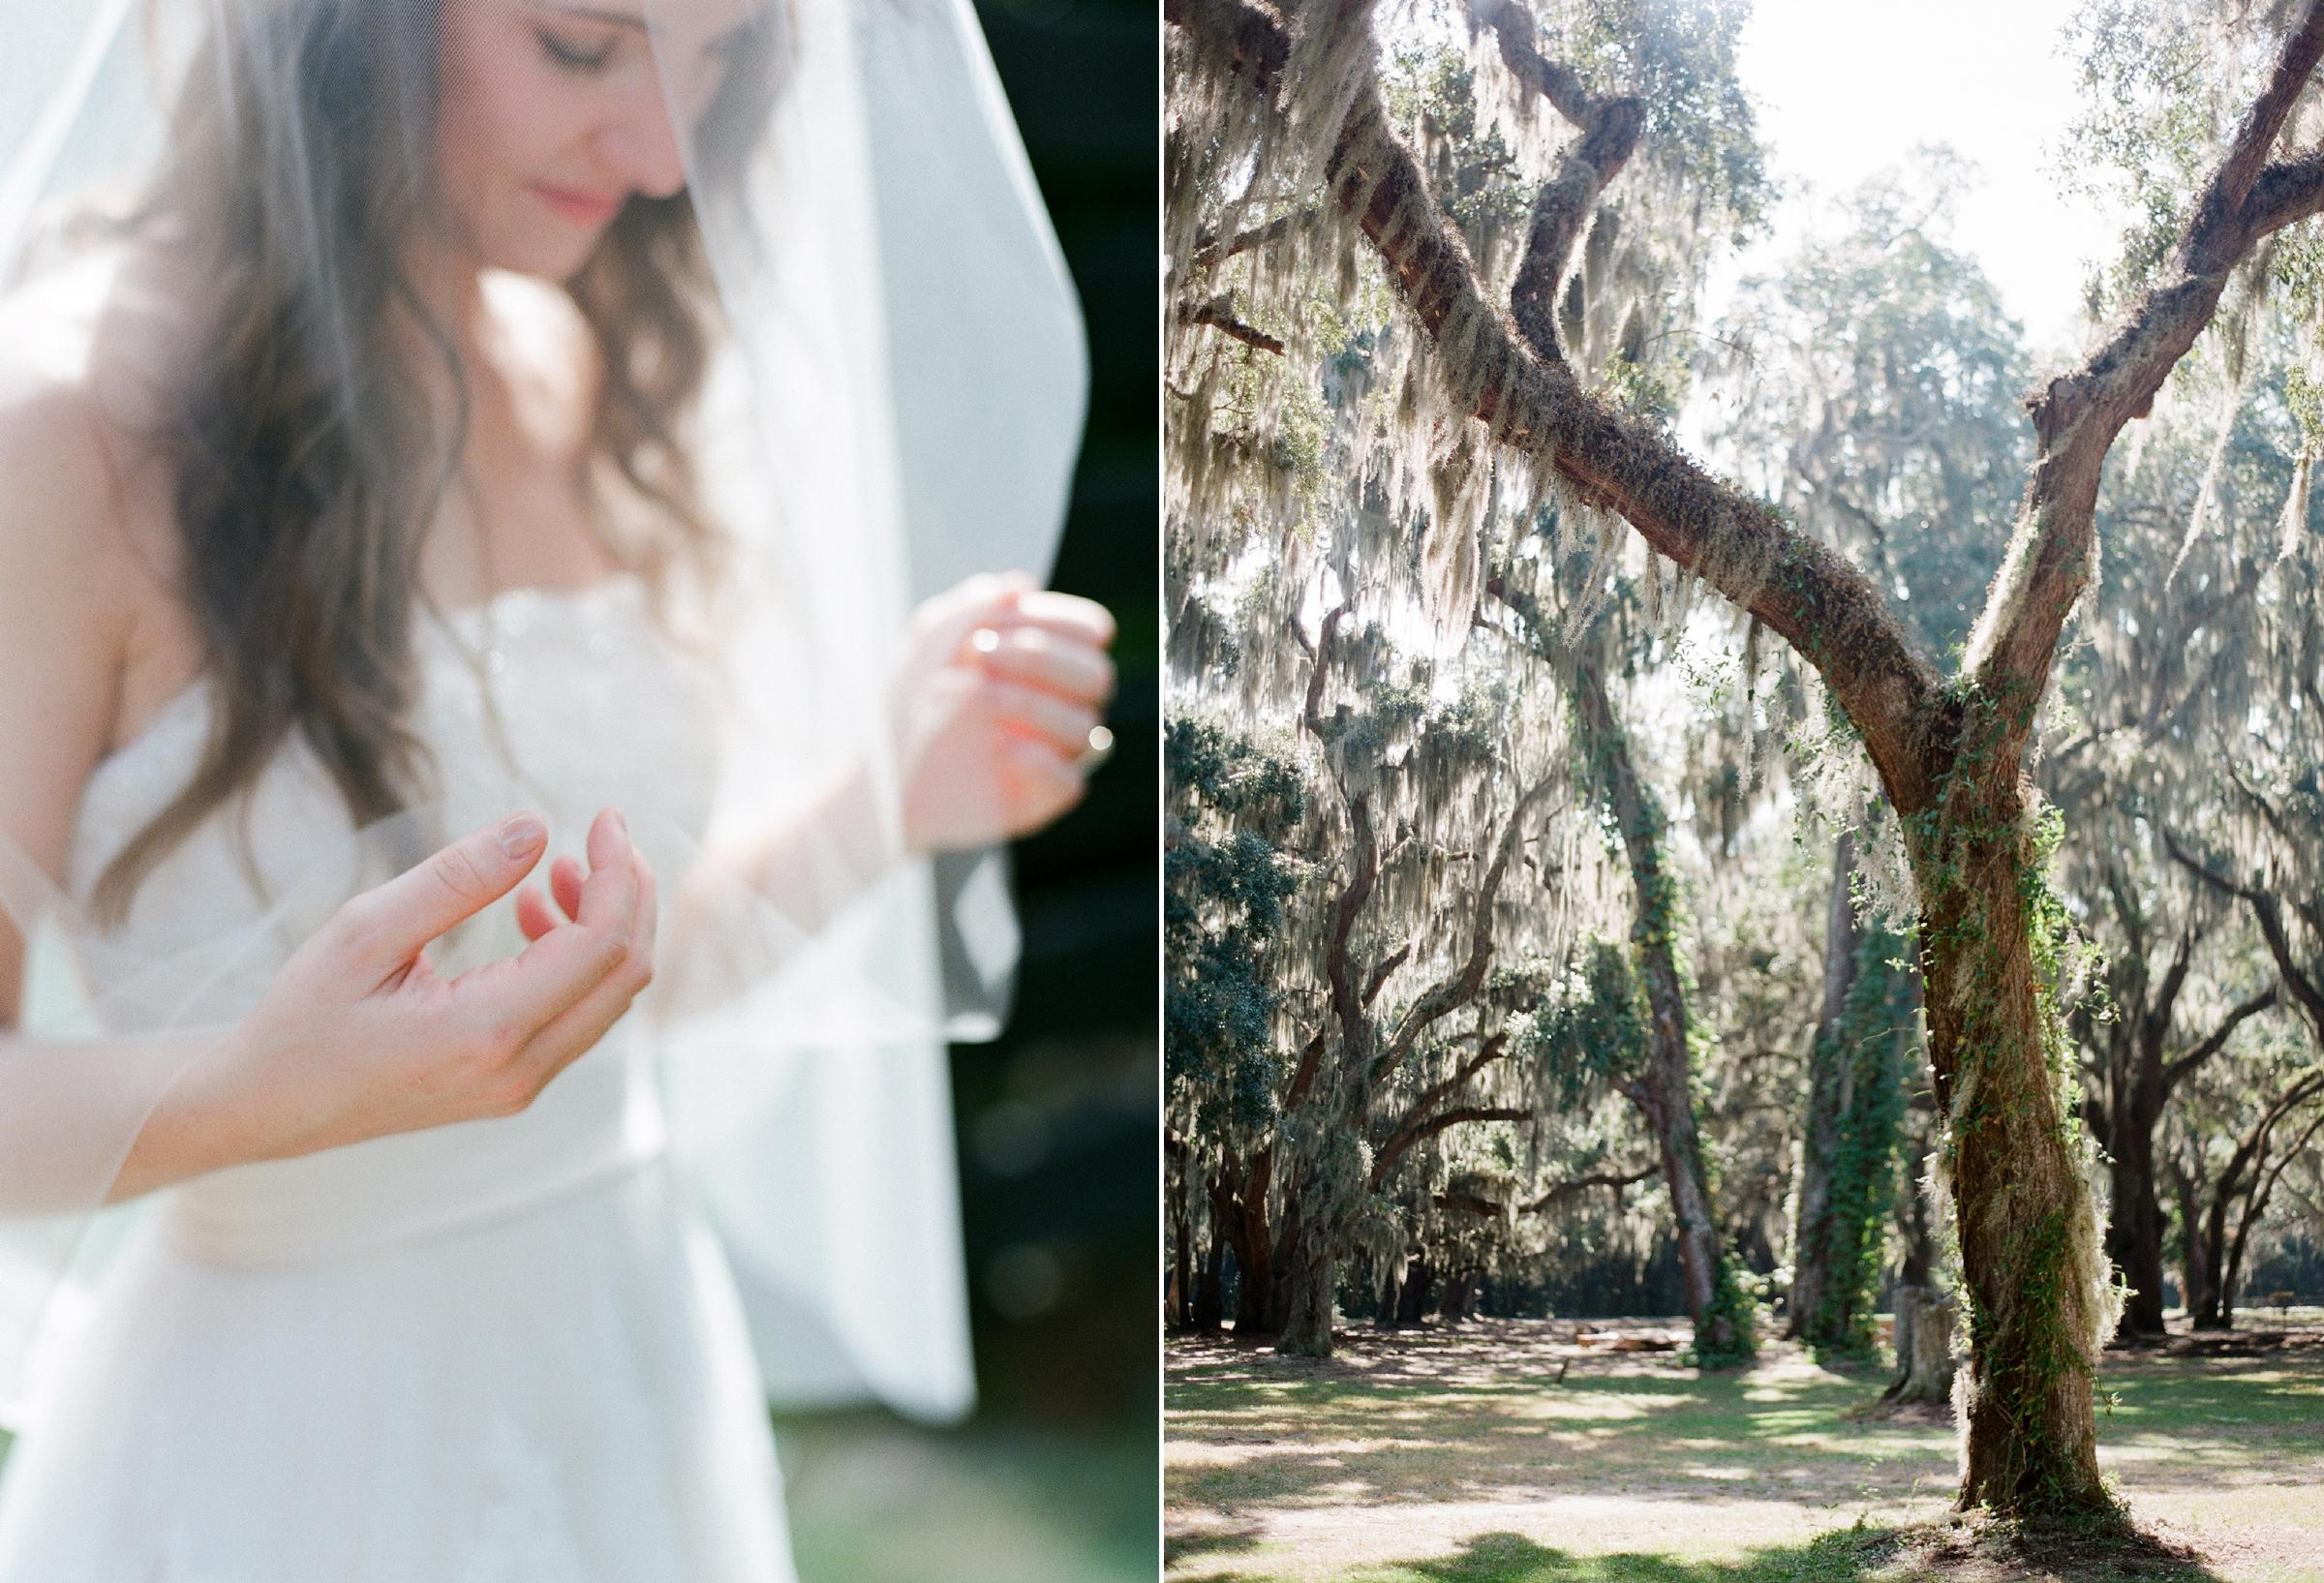 st_simons_island_wedding_photographer_shannon_griffin_0023.jpg